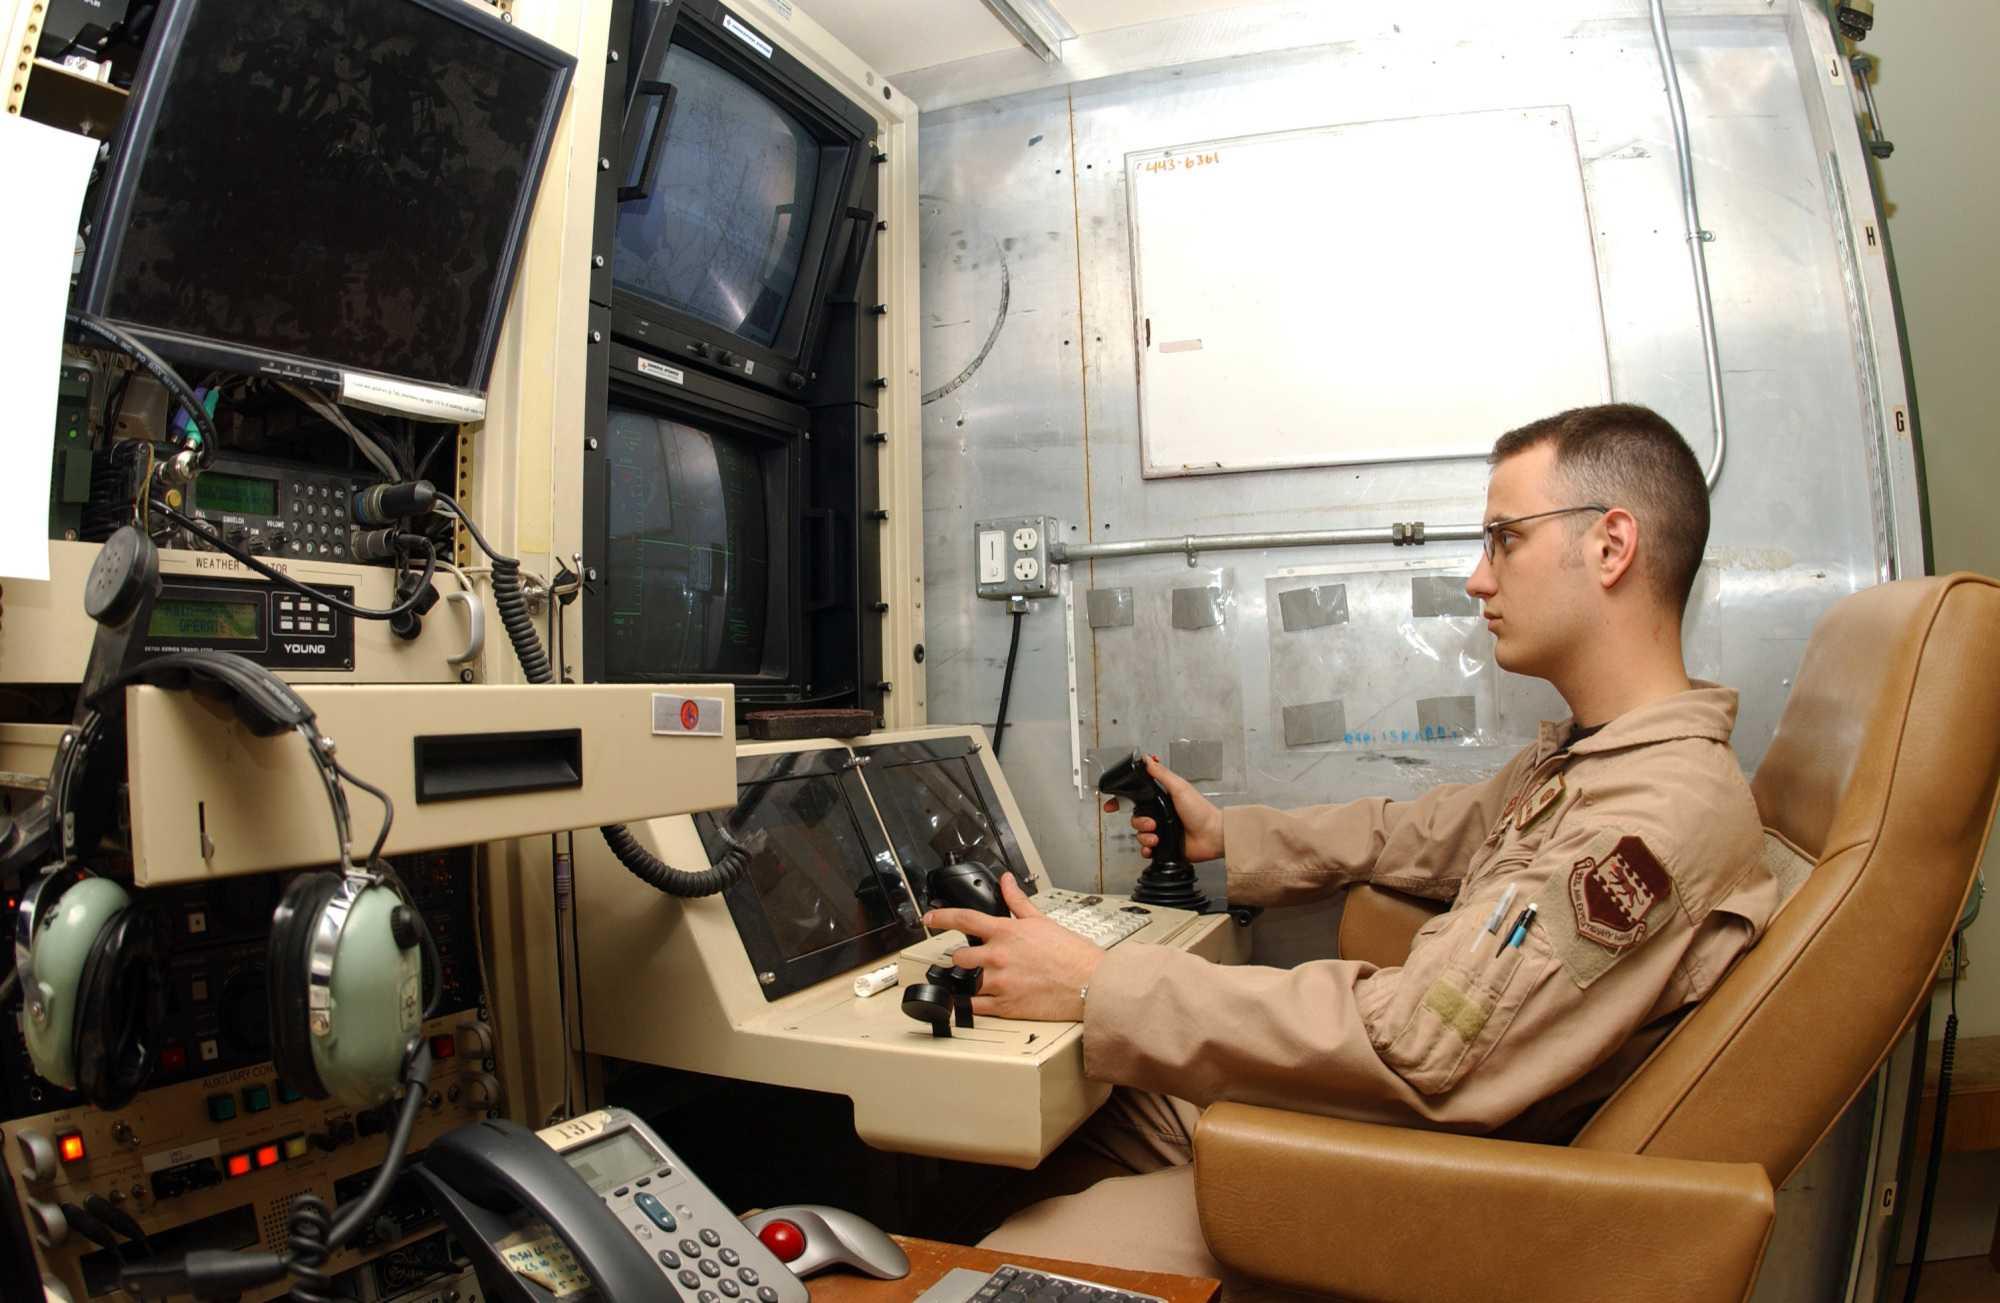 US-Soldat am Sensorenpult einer Kampfdrohne